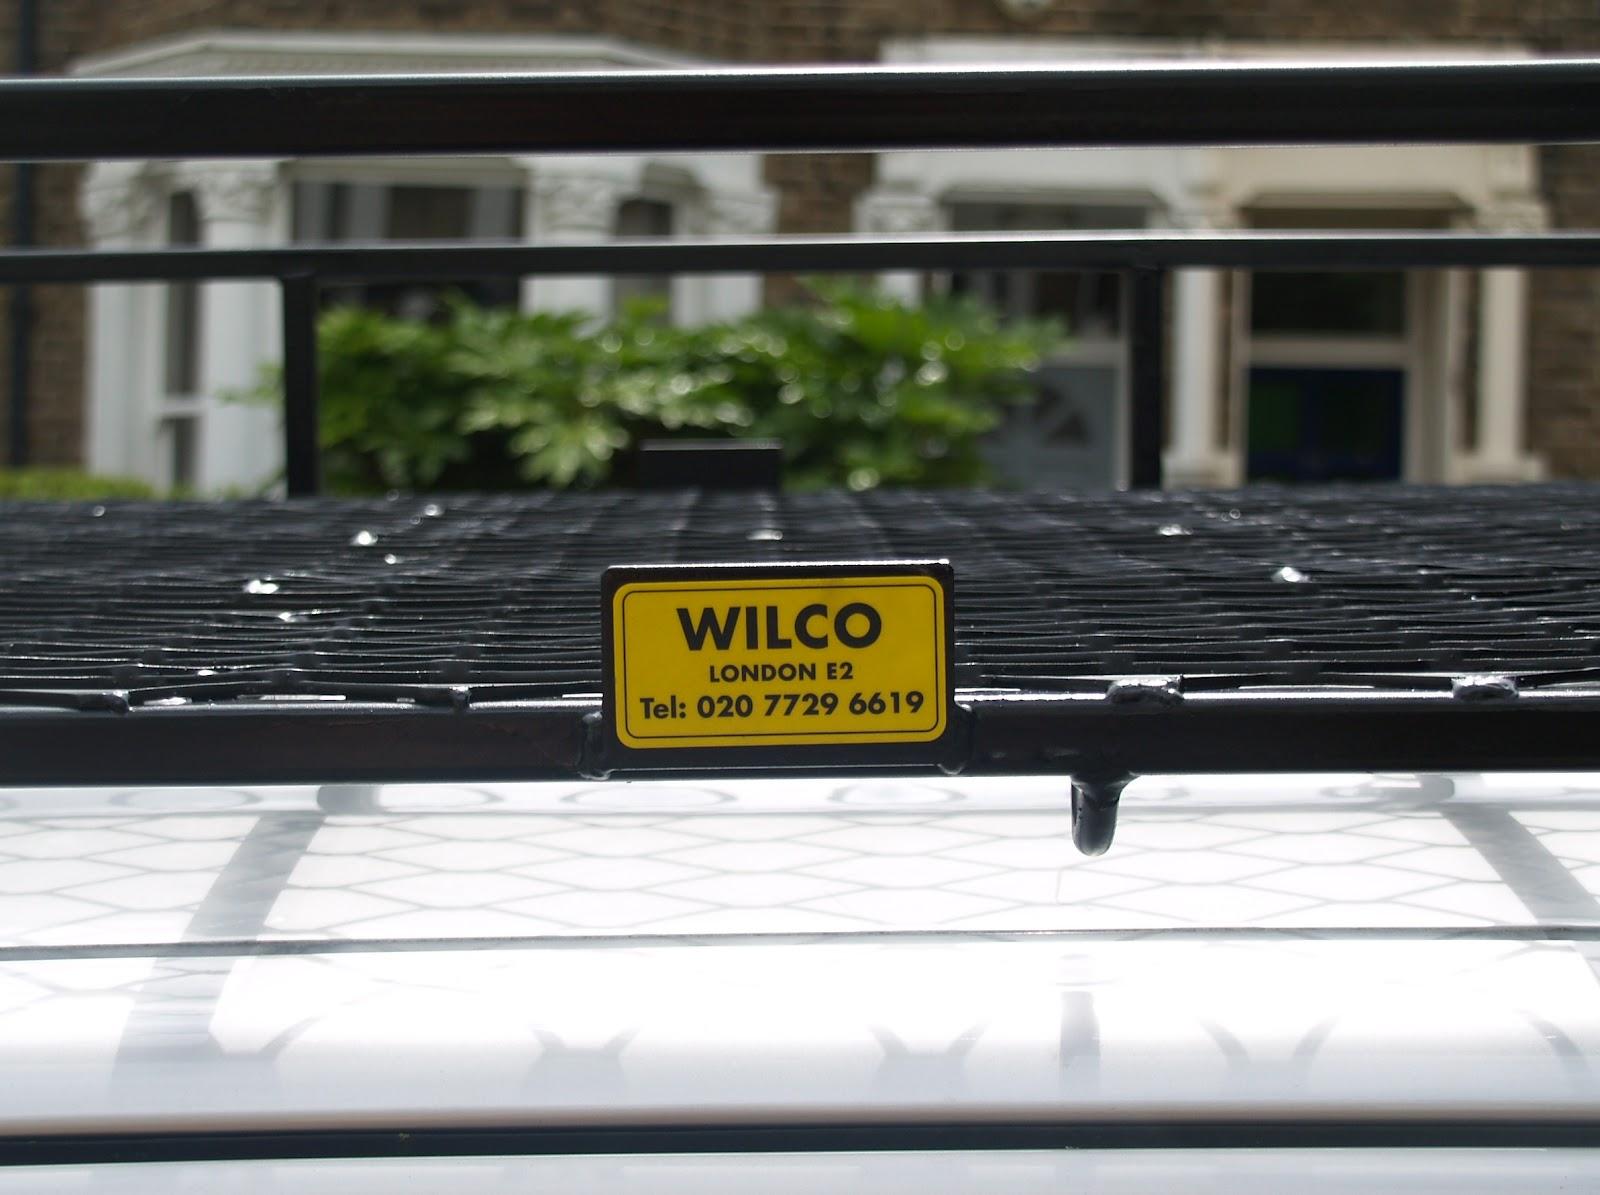 Wilco Roof Racks